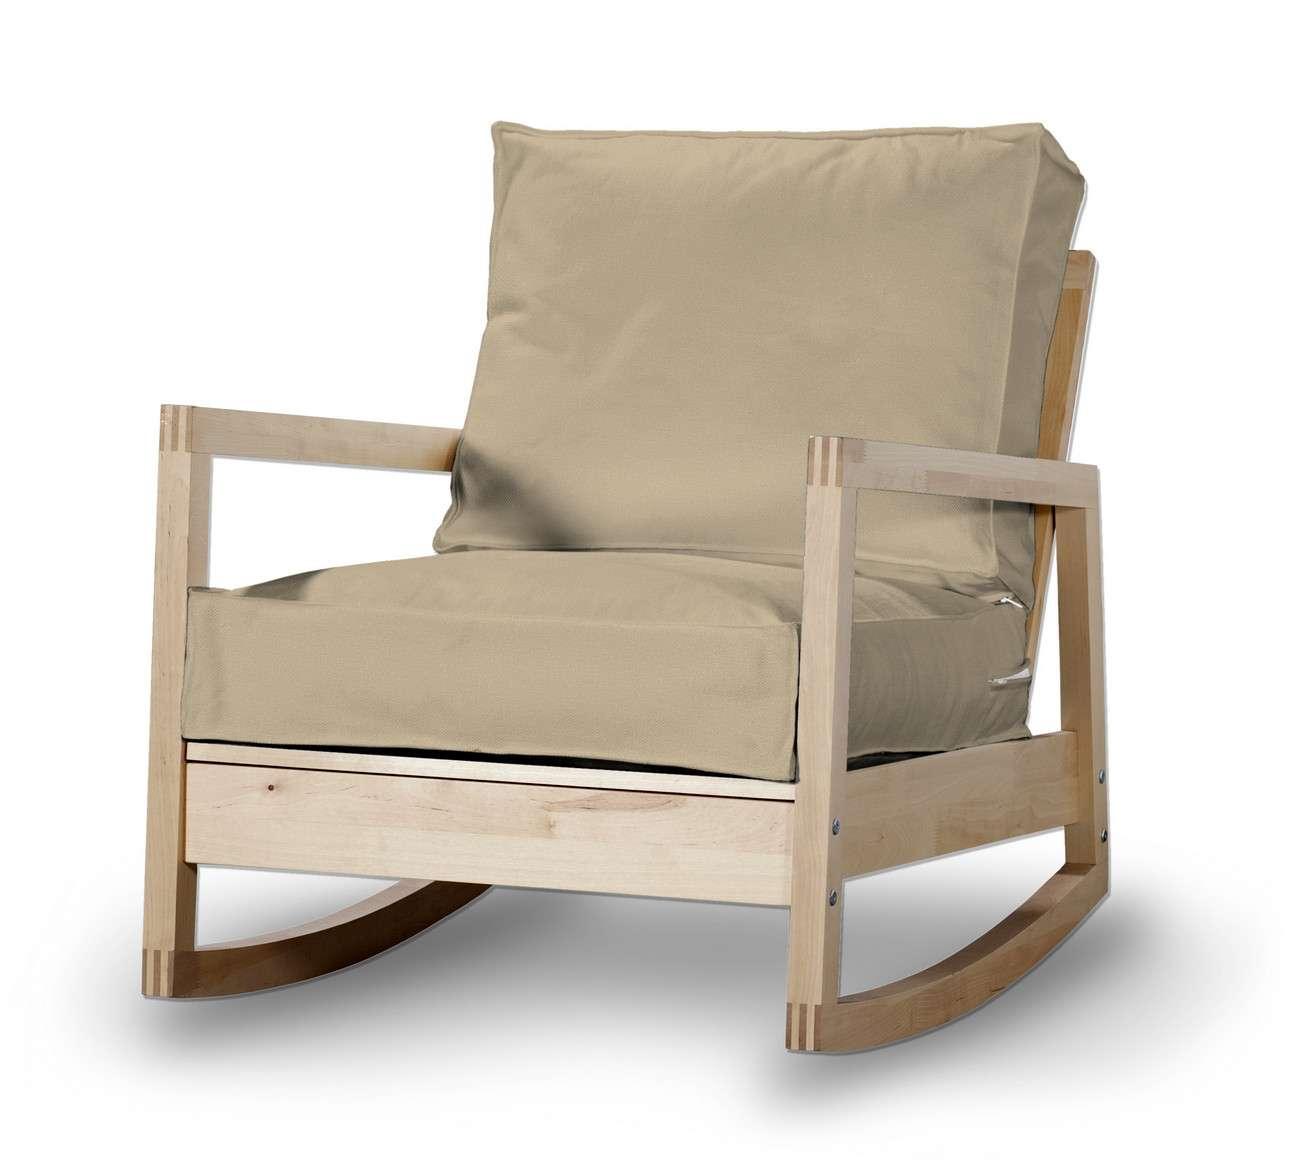 Pokrowiec na fotel Lillberg w kolekcji Living, tkanina: 160-82